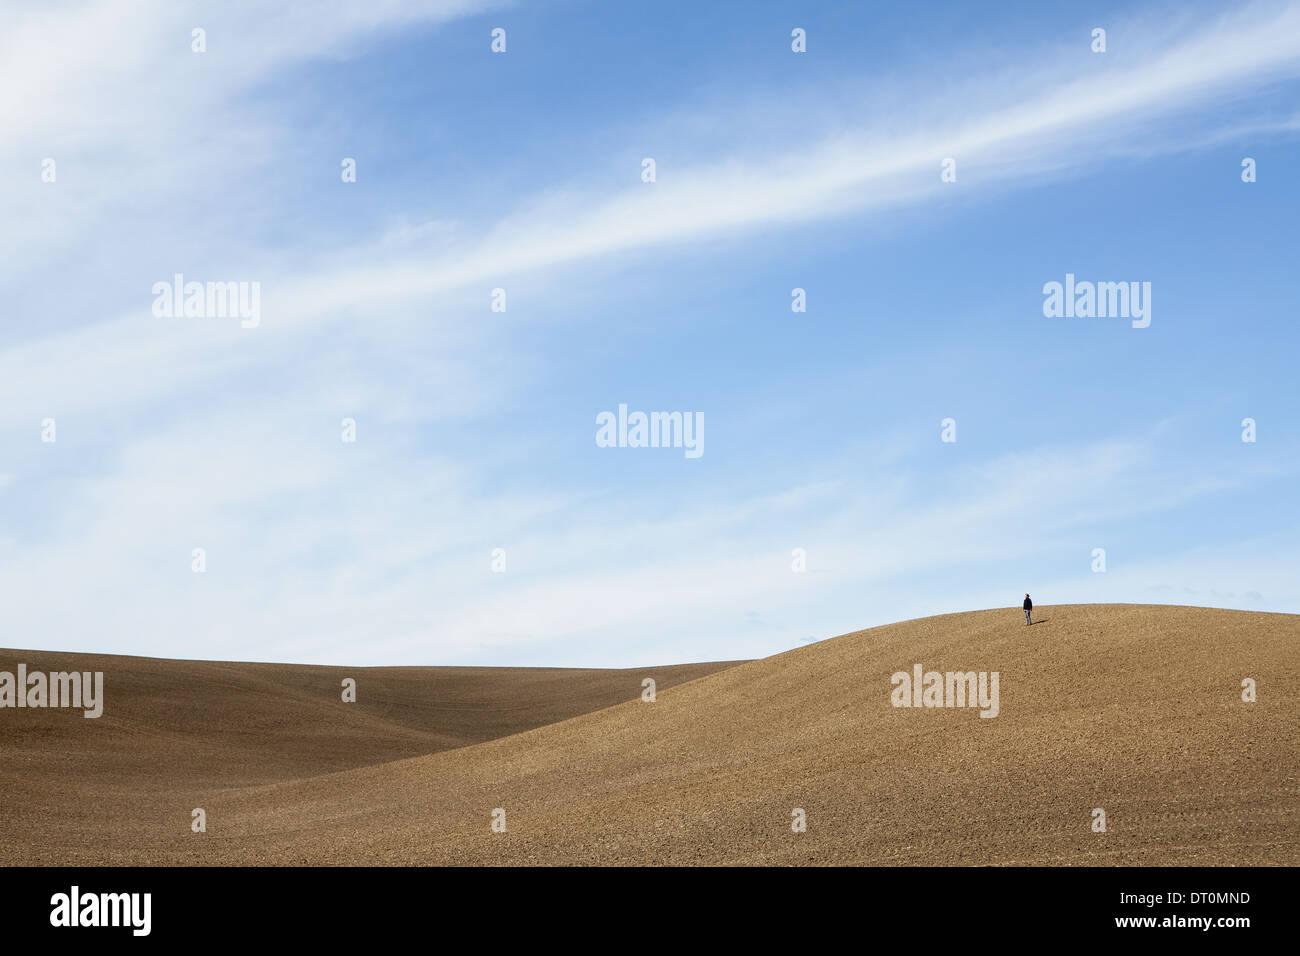 Washington USA person on ridgeploughed soil rolling downland - Stock Image